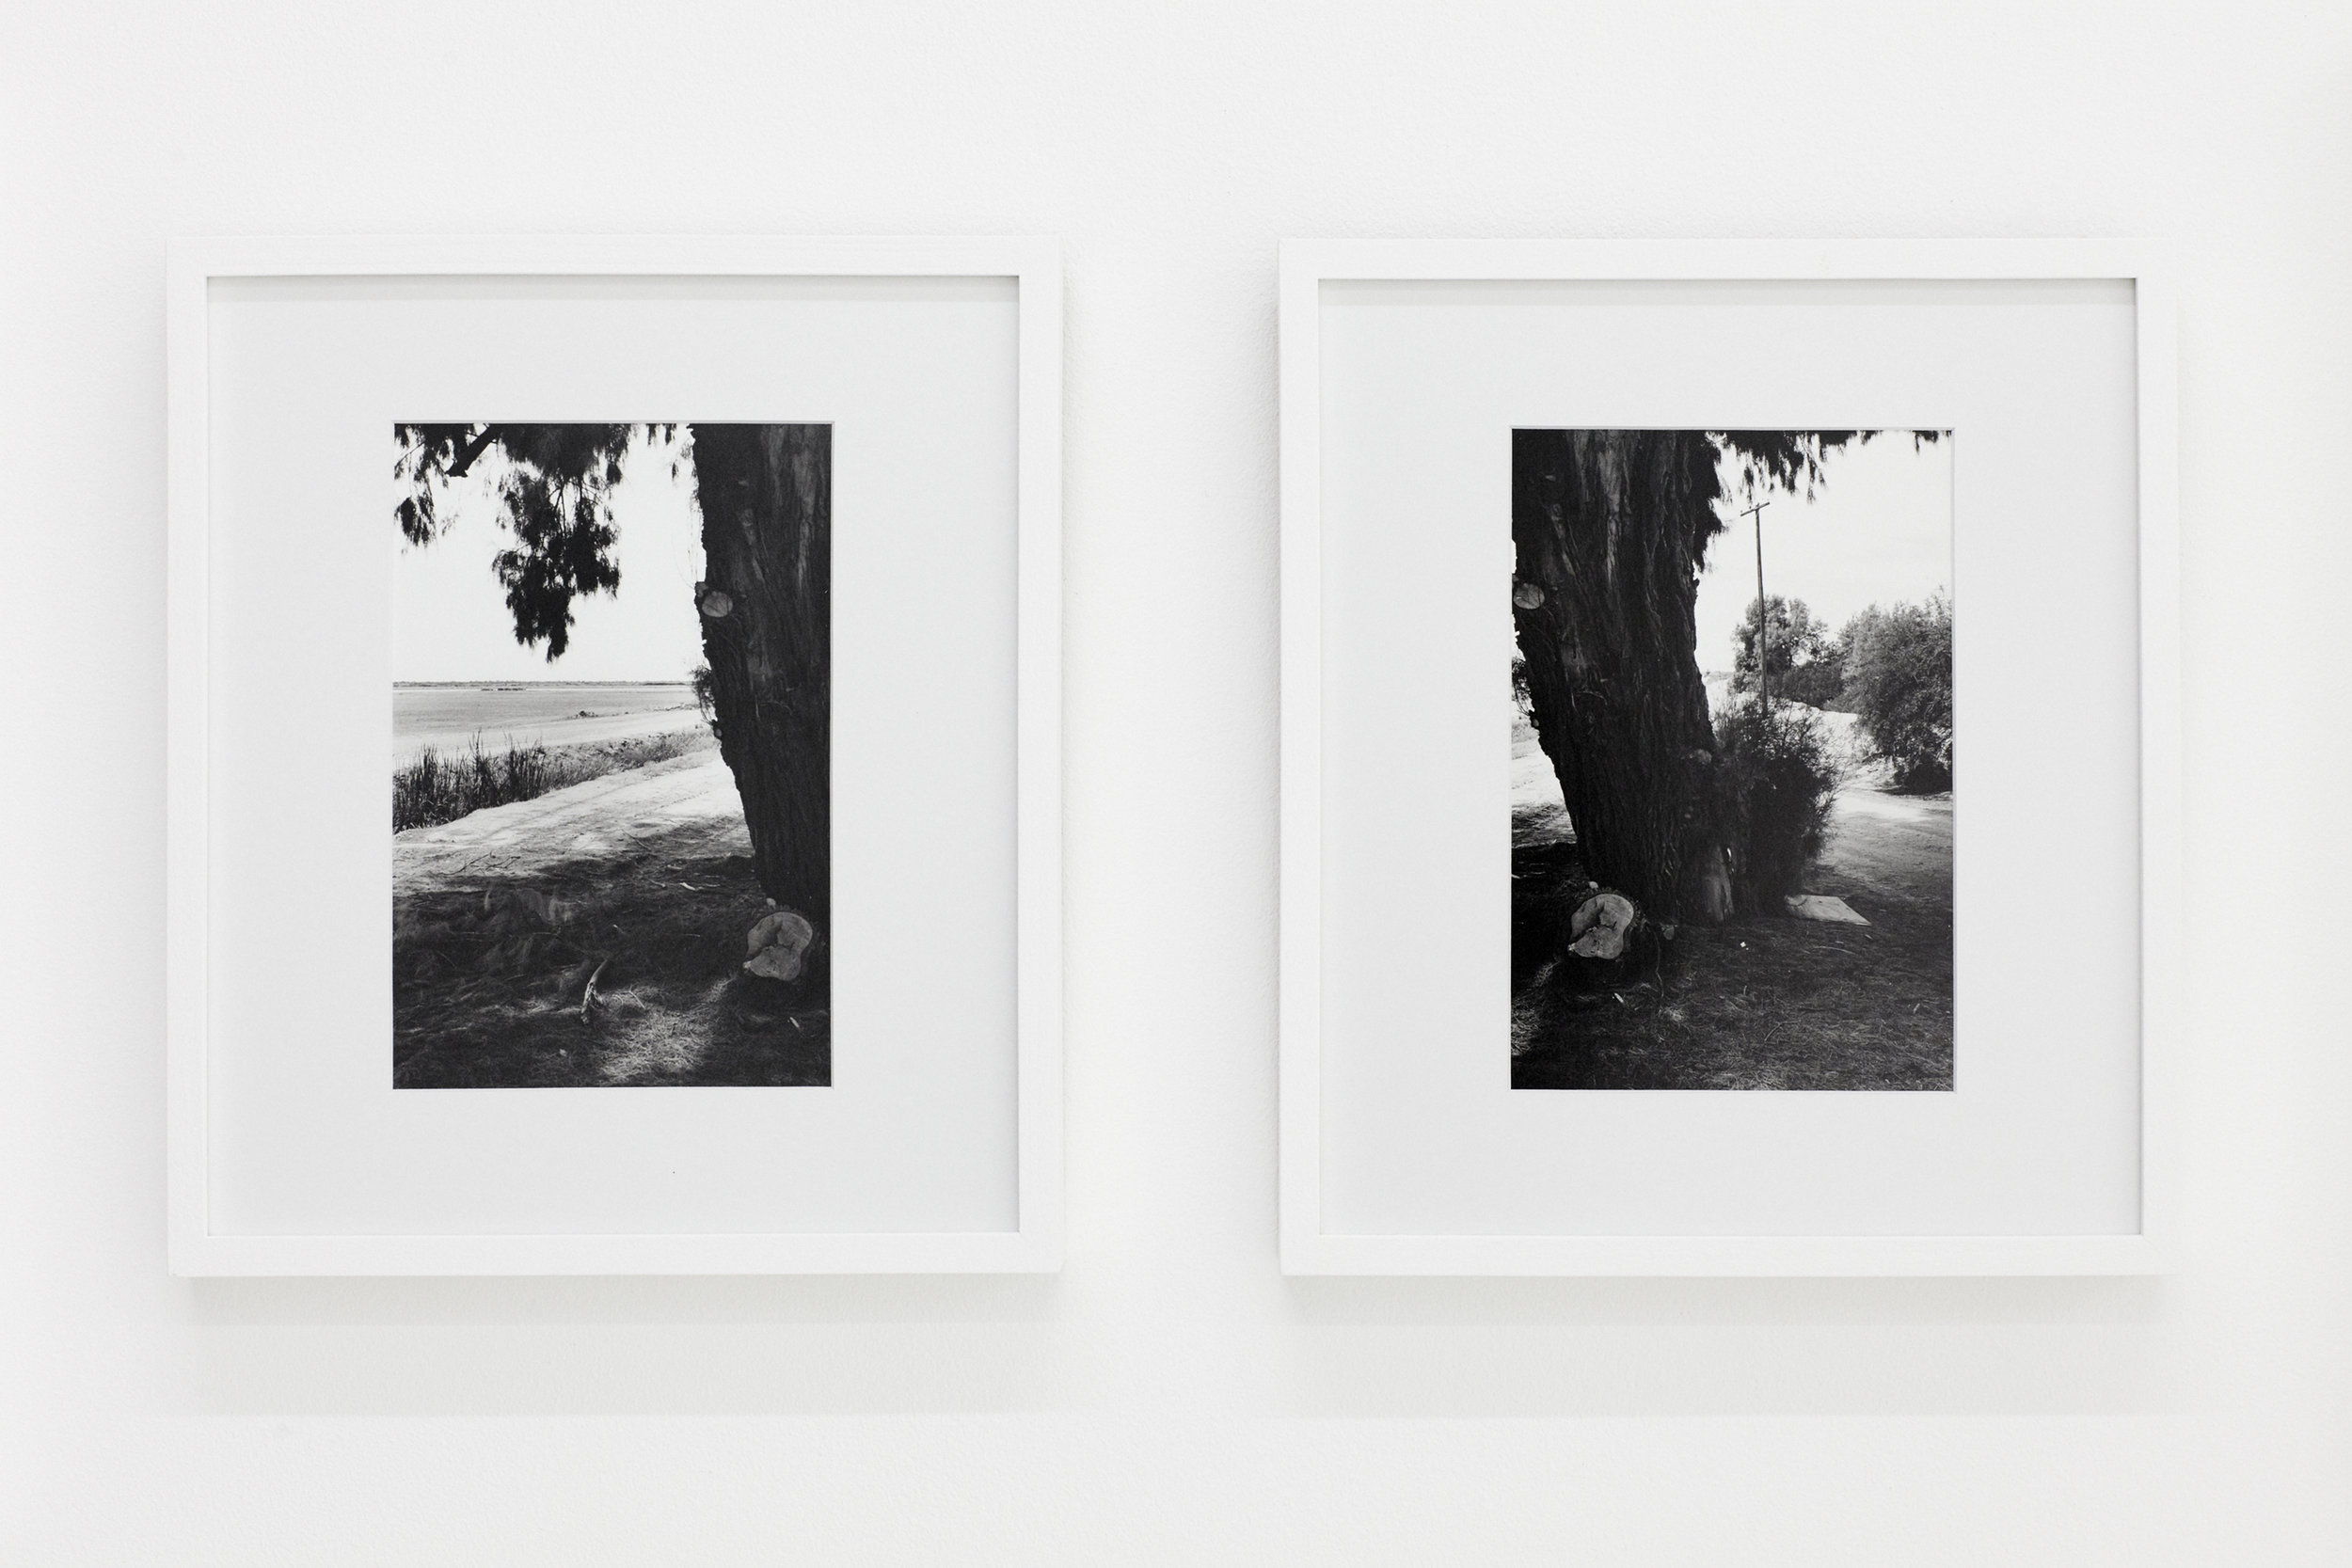 62, California', (2017)   Silver gelatin  prints. Framed diptych    8x10 in,silver gelatin prints.    Edition of 2